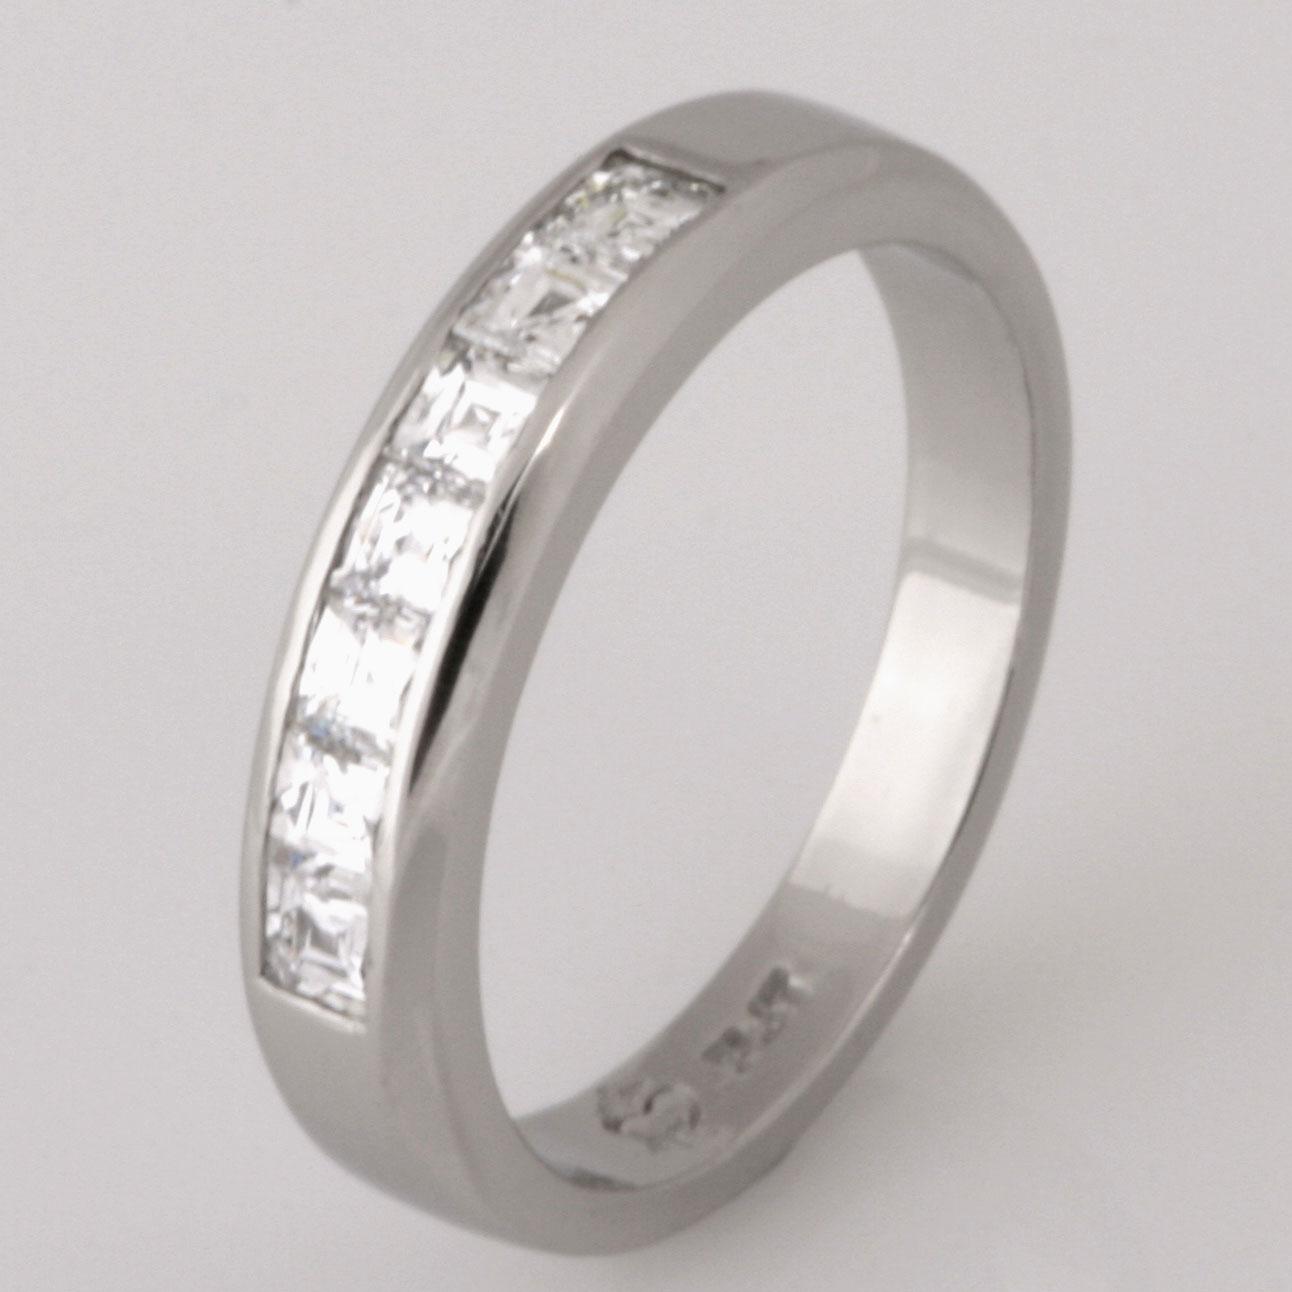 Handmade ladies platinum 'Tycoon' cut diamond wedding ring